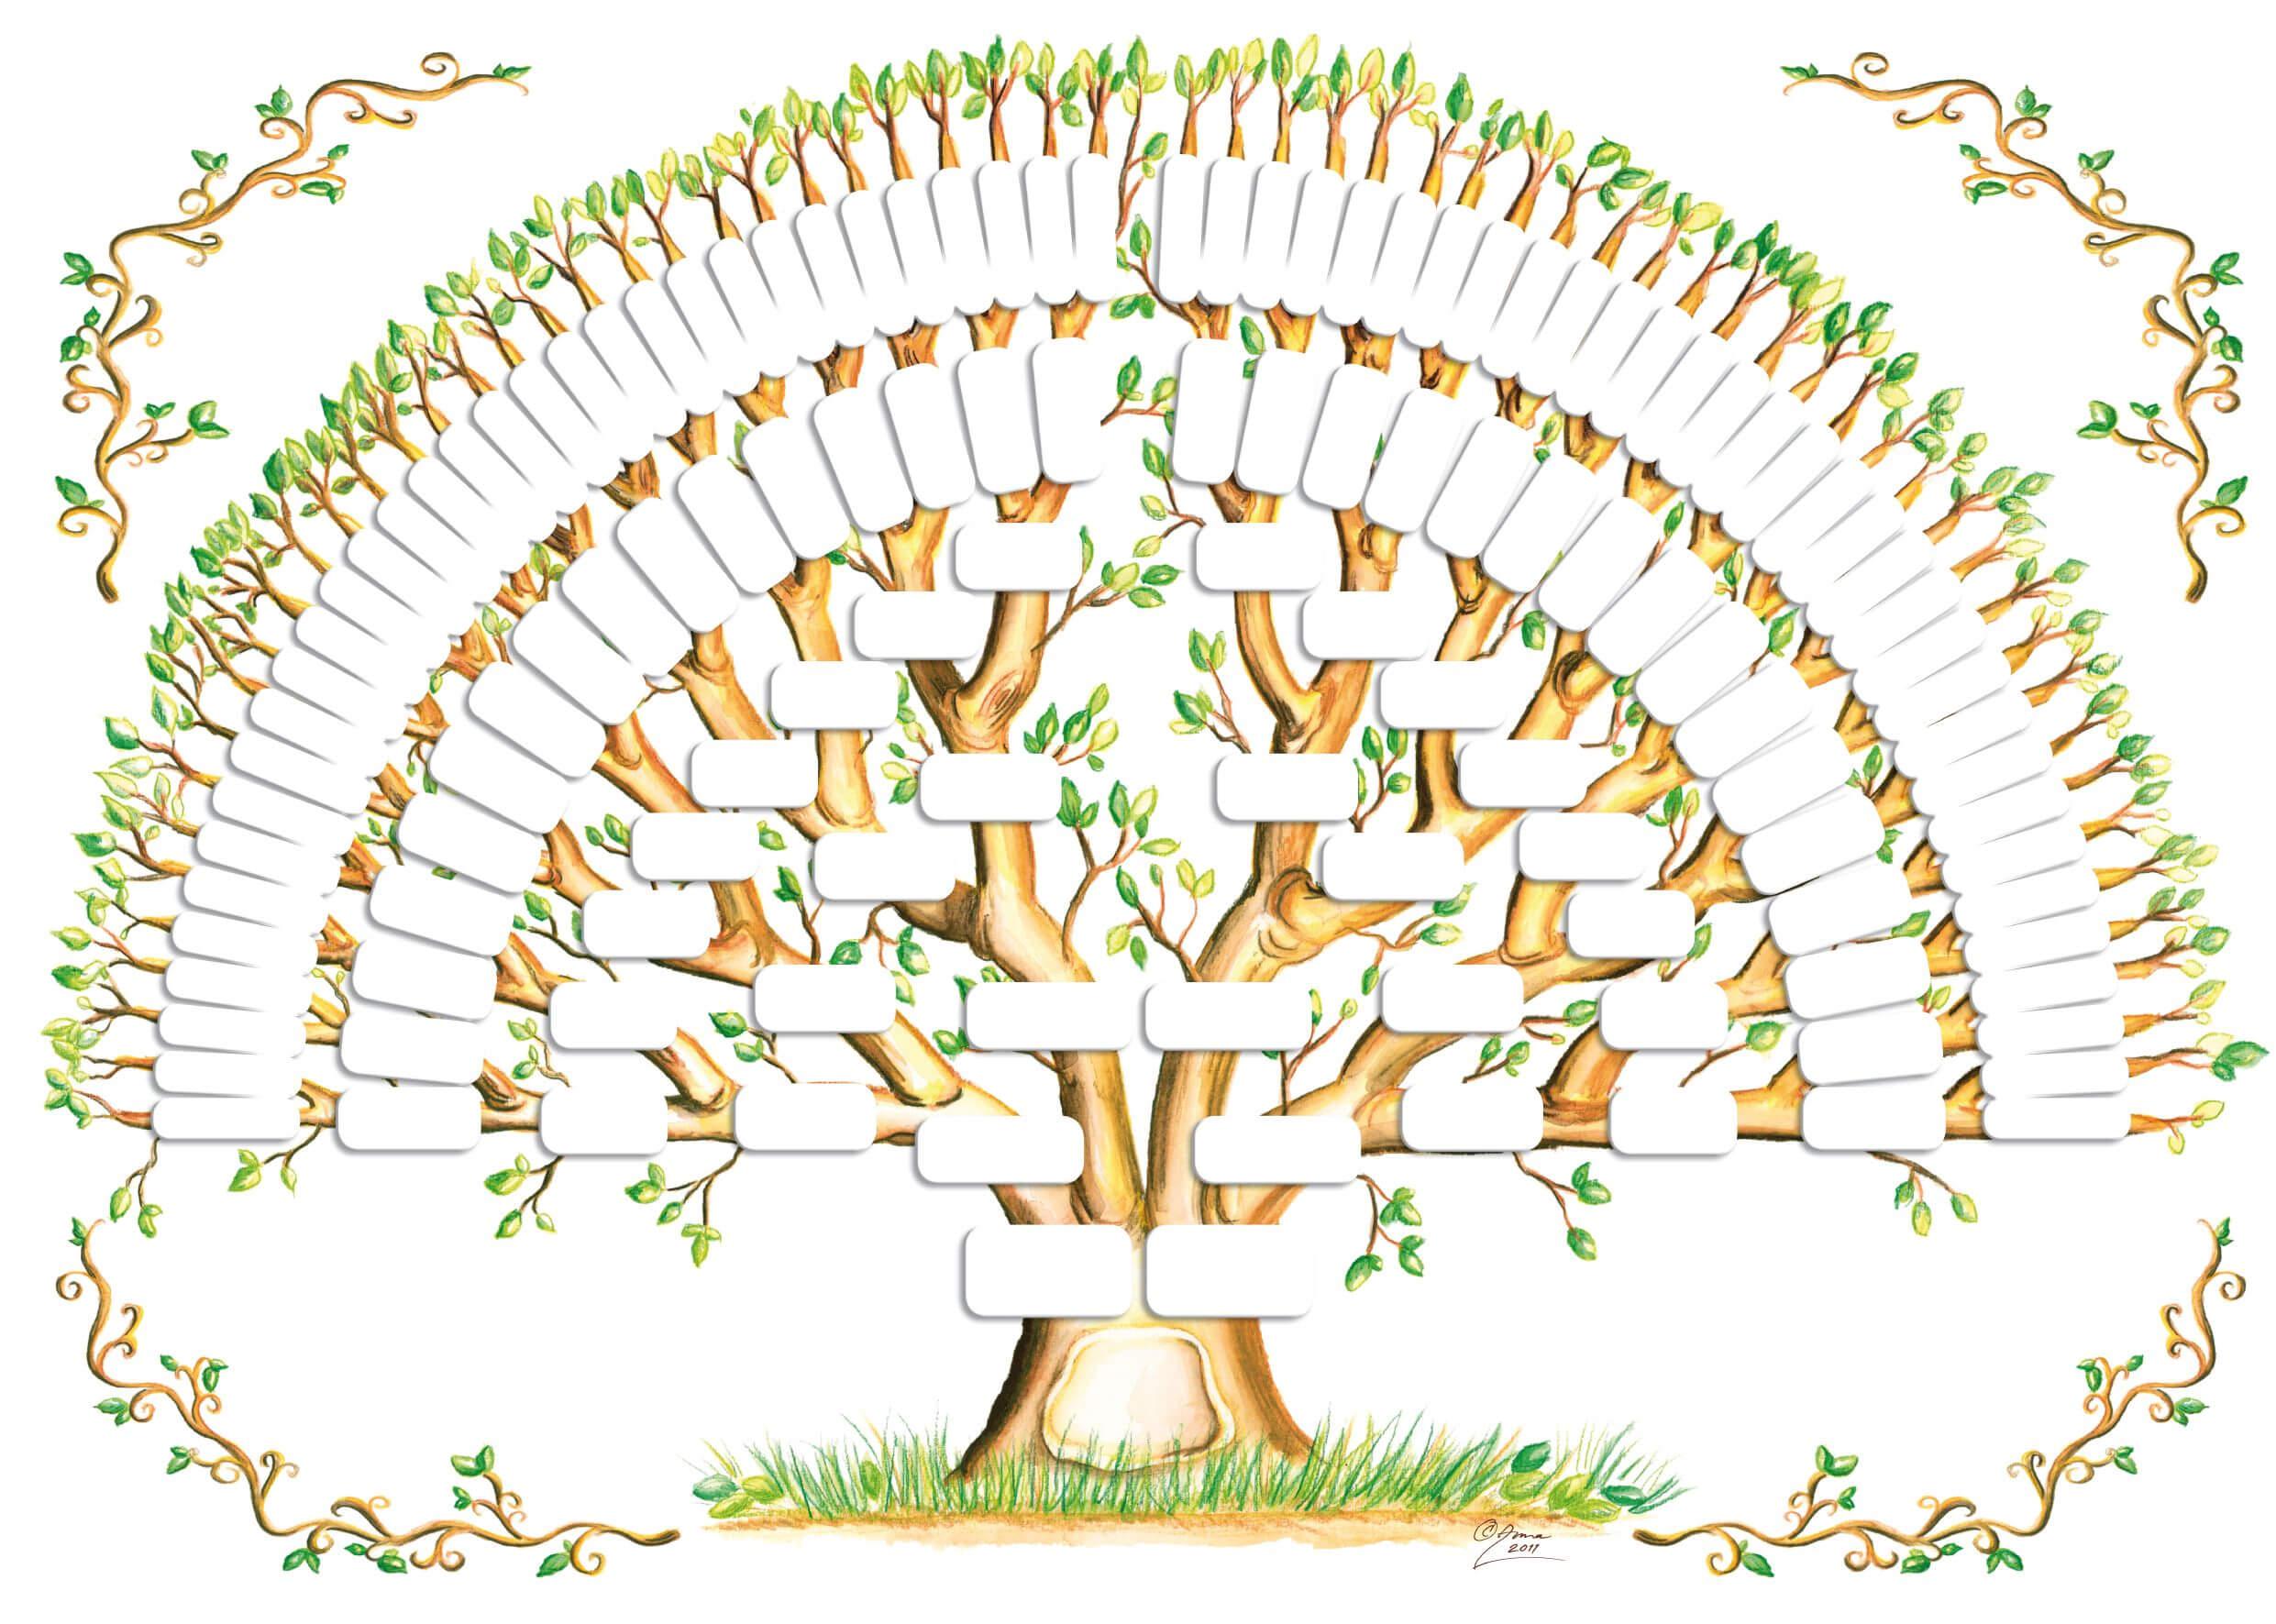 5 Generation Family Tree Template Tree Gallery | Genealogy regarding Blank Family Tree Template 3 Generations